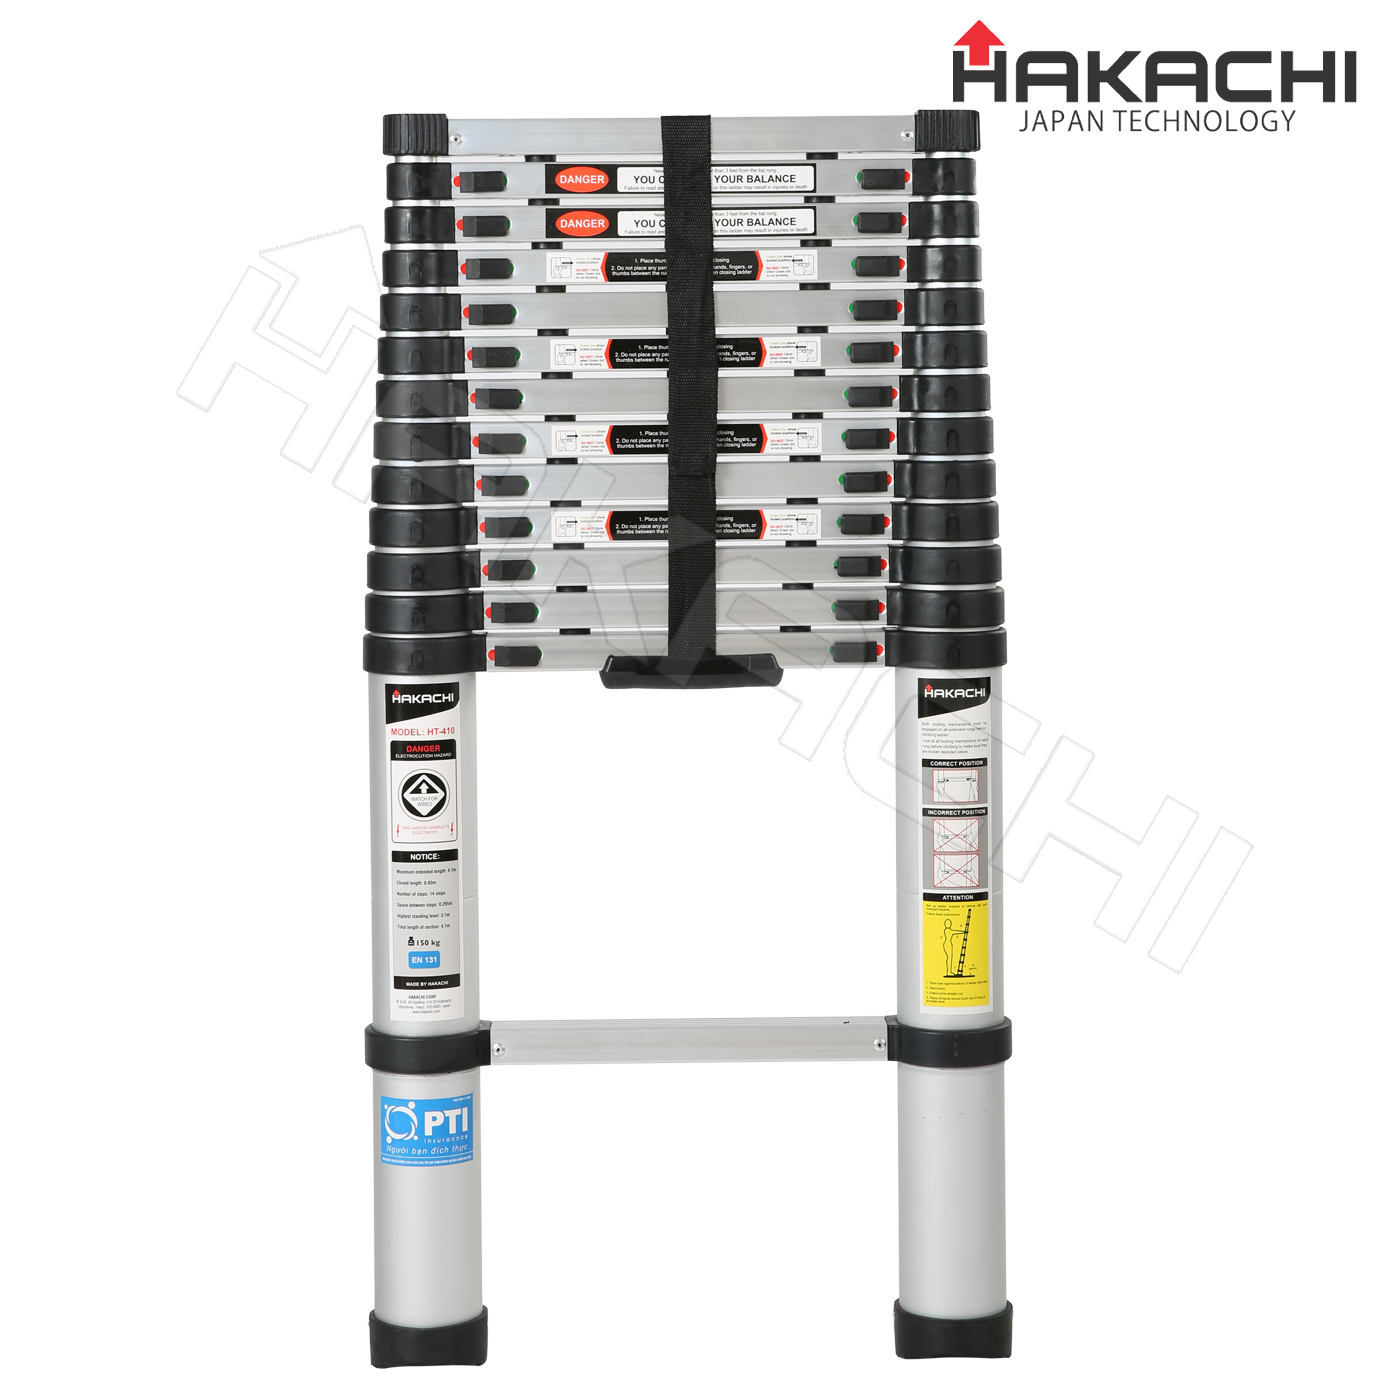 Hakachi HT- 410